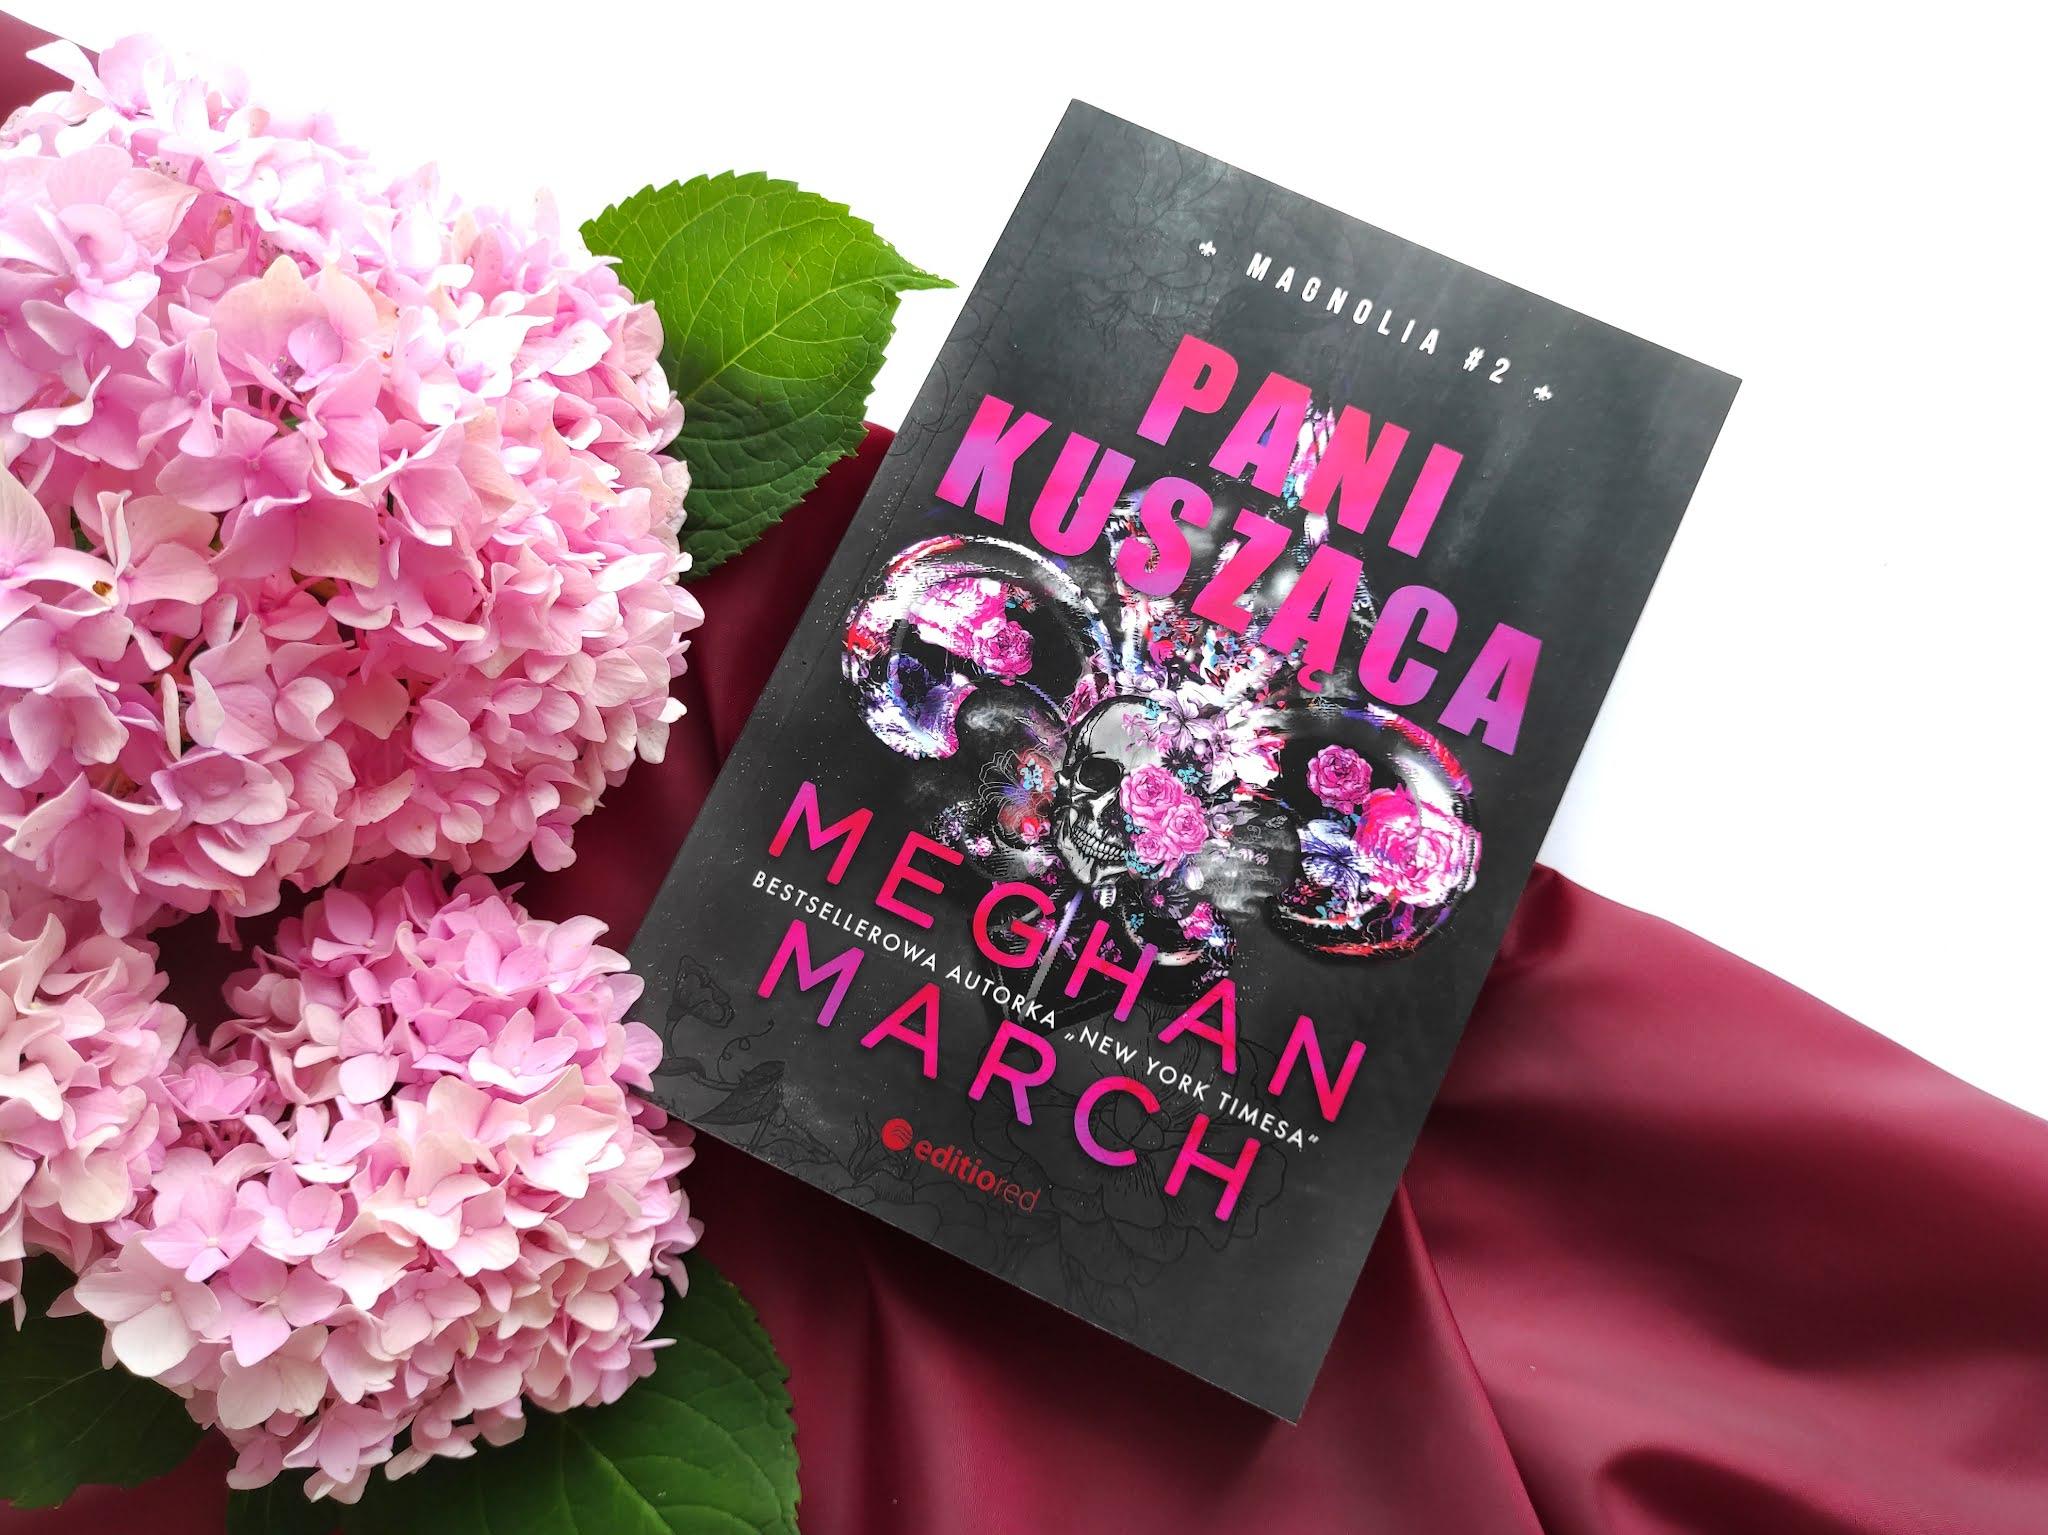 Pani kusząca Meghan March